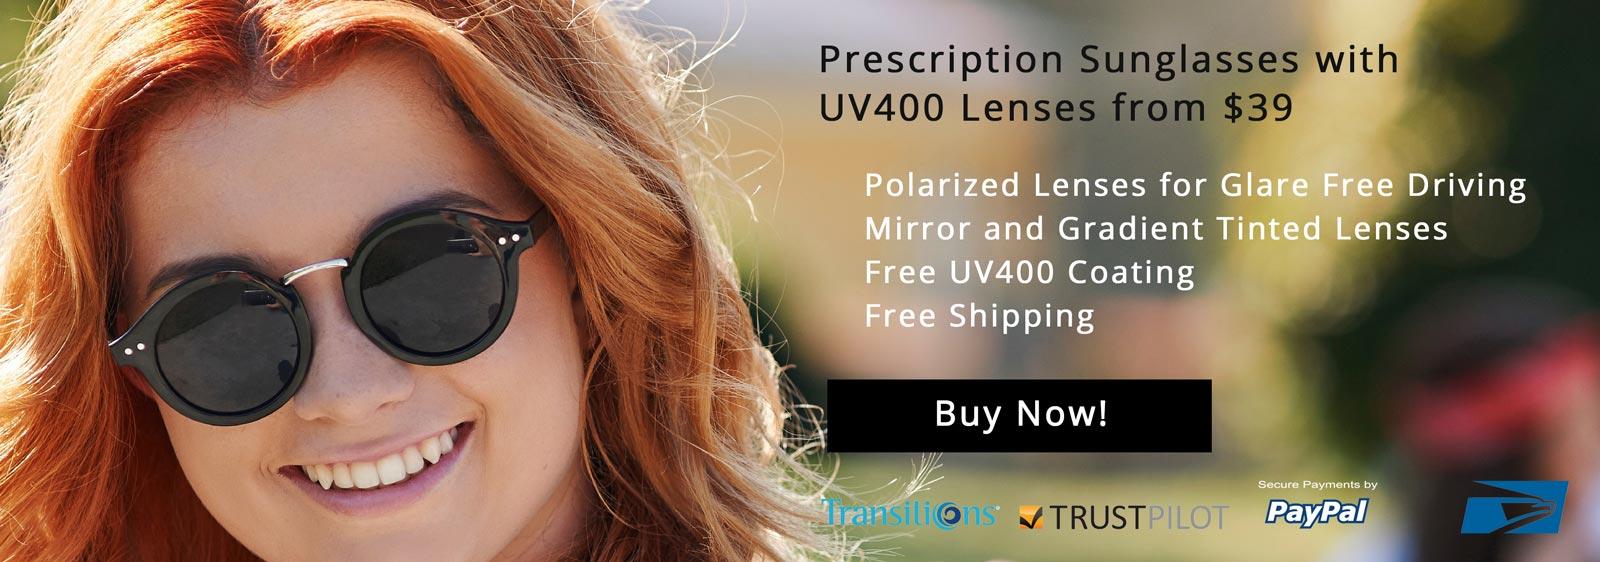 Prescription Sunglasses with UV400 Lenses from $39